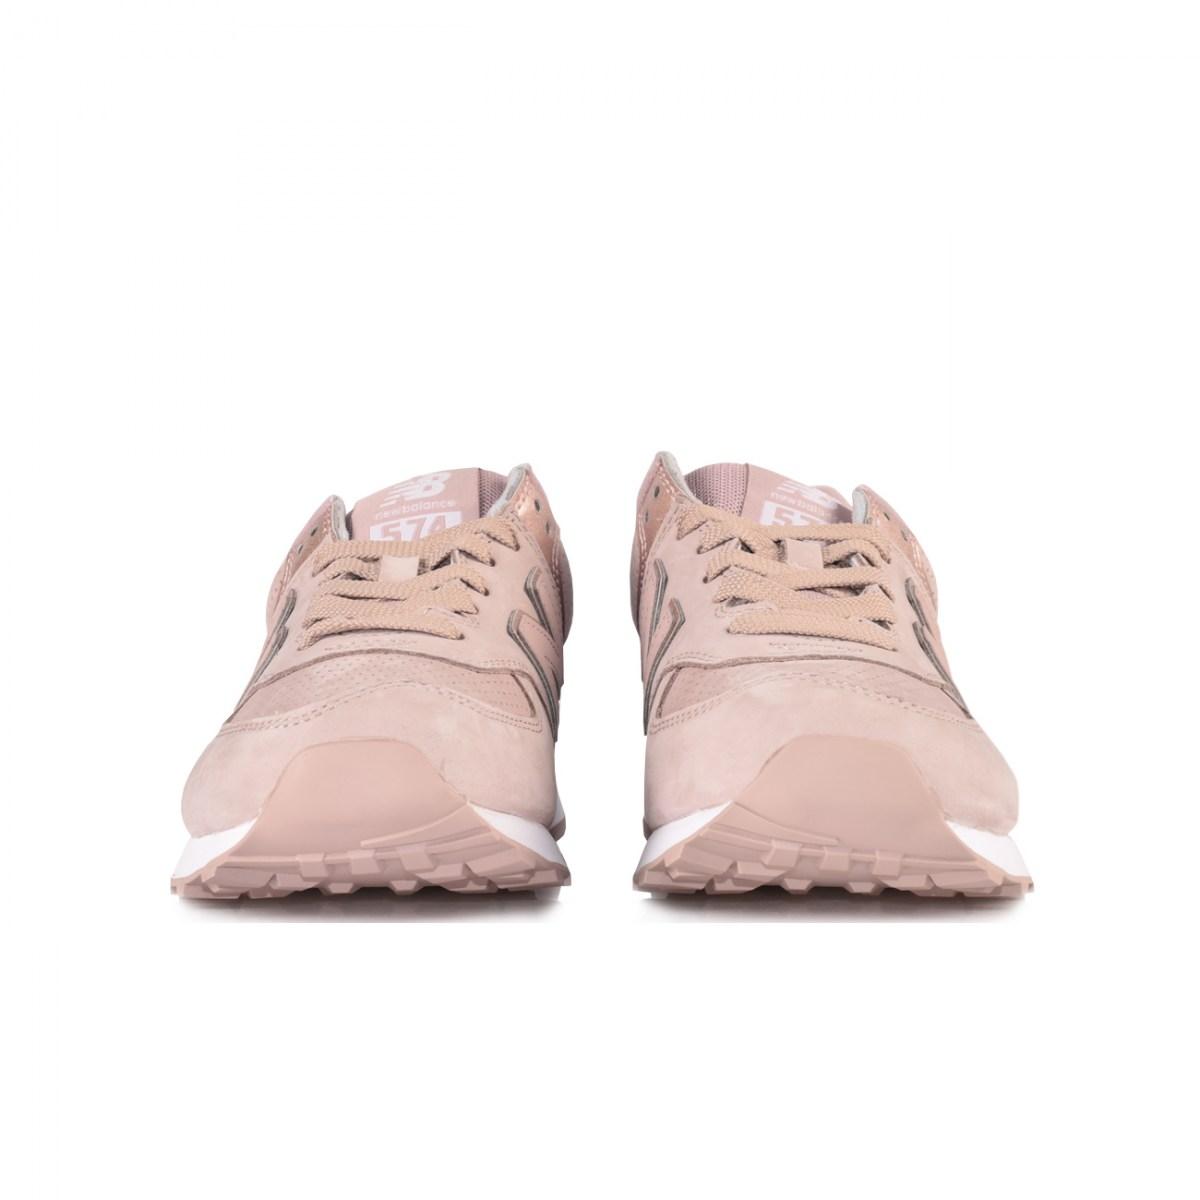 sports shoes 59397 9e402 NEW BALANCE 574 NUBUCK WL574NBM NUDE